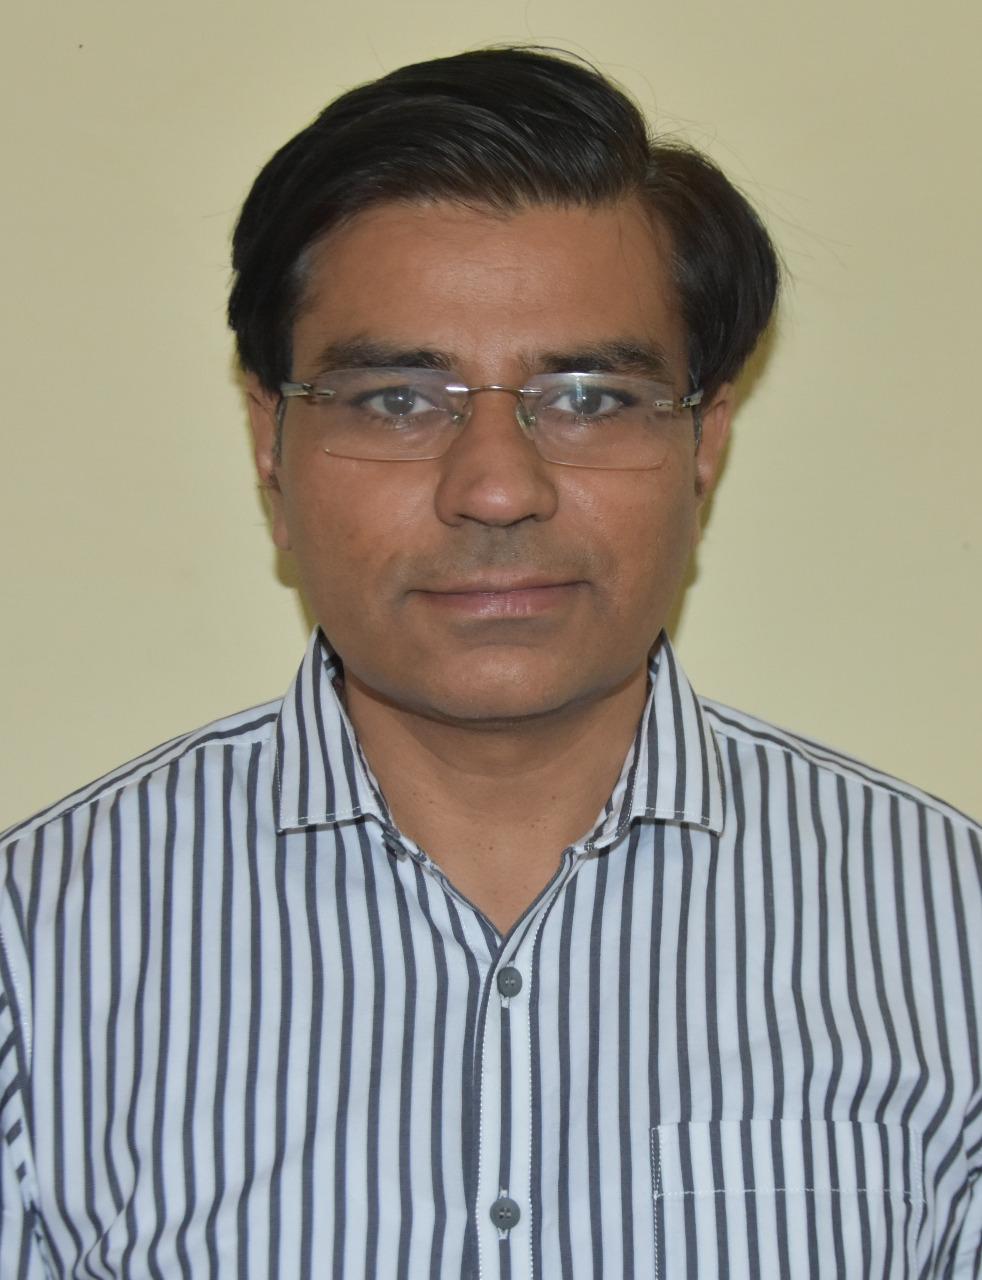 इंजी. संजीव दत्त शर्मा